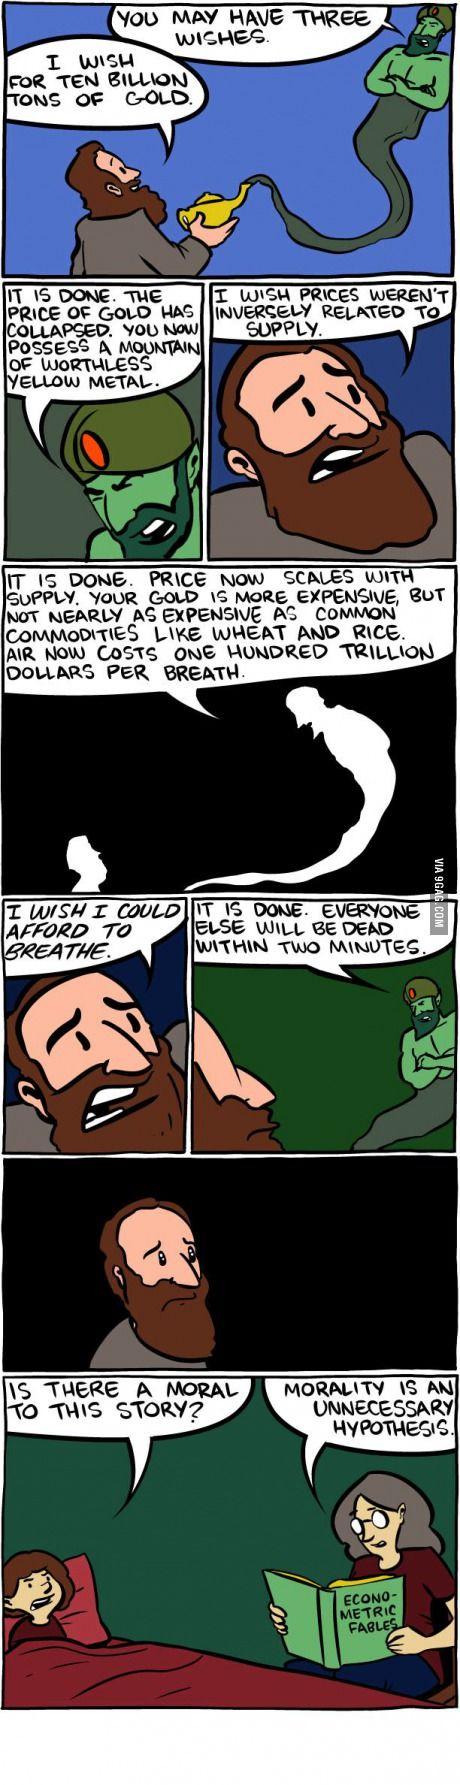 Economics humor. I love this so much!